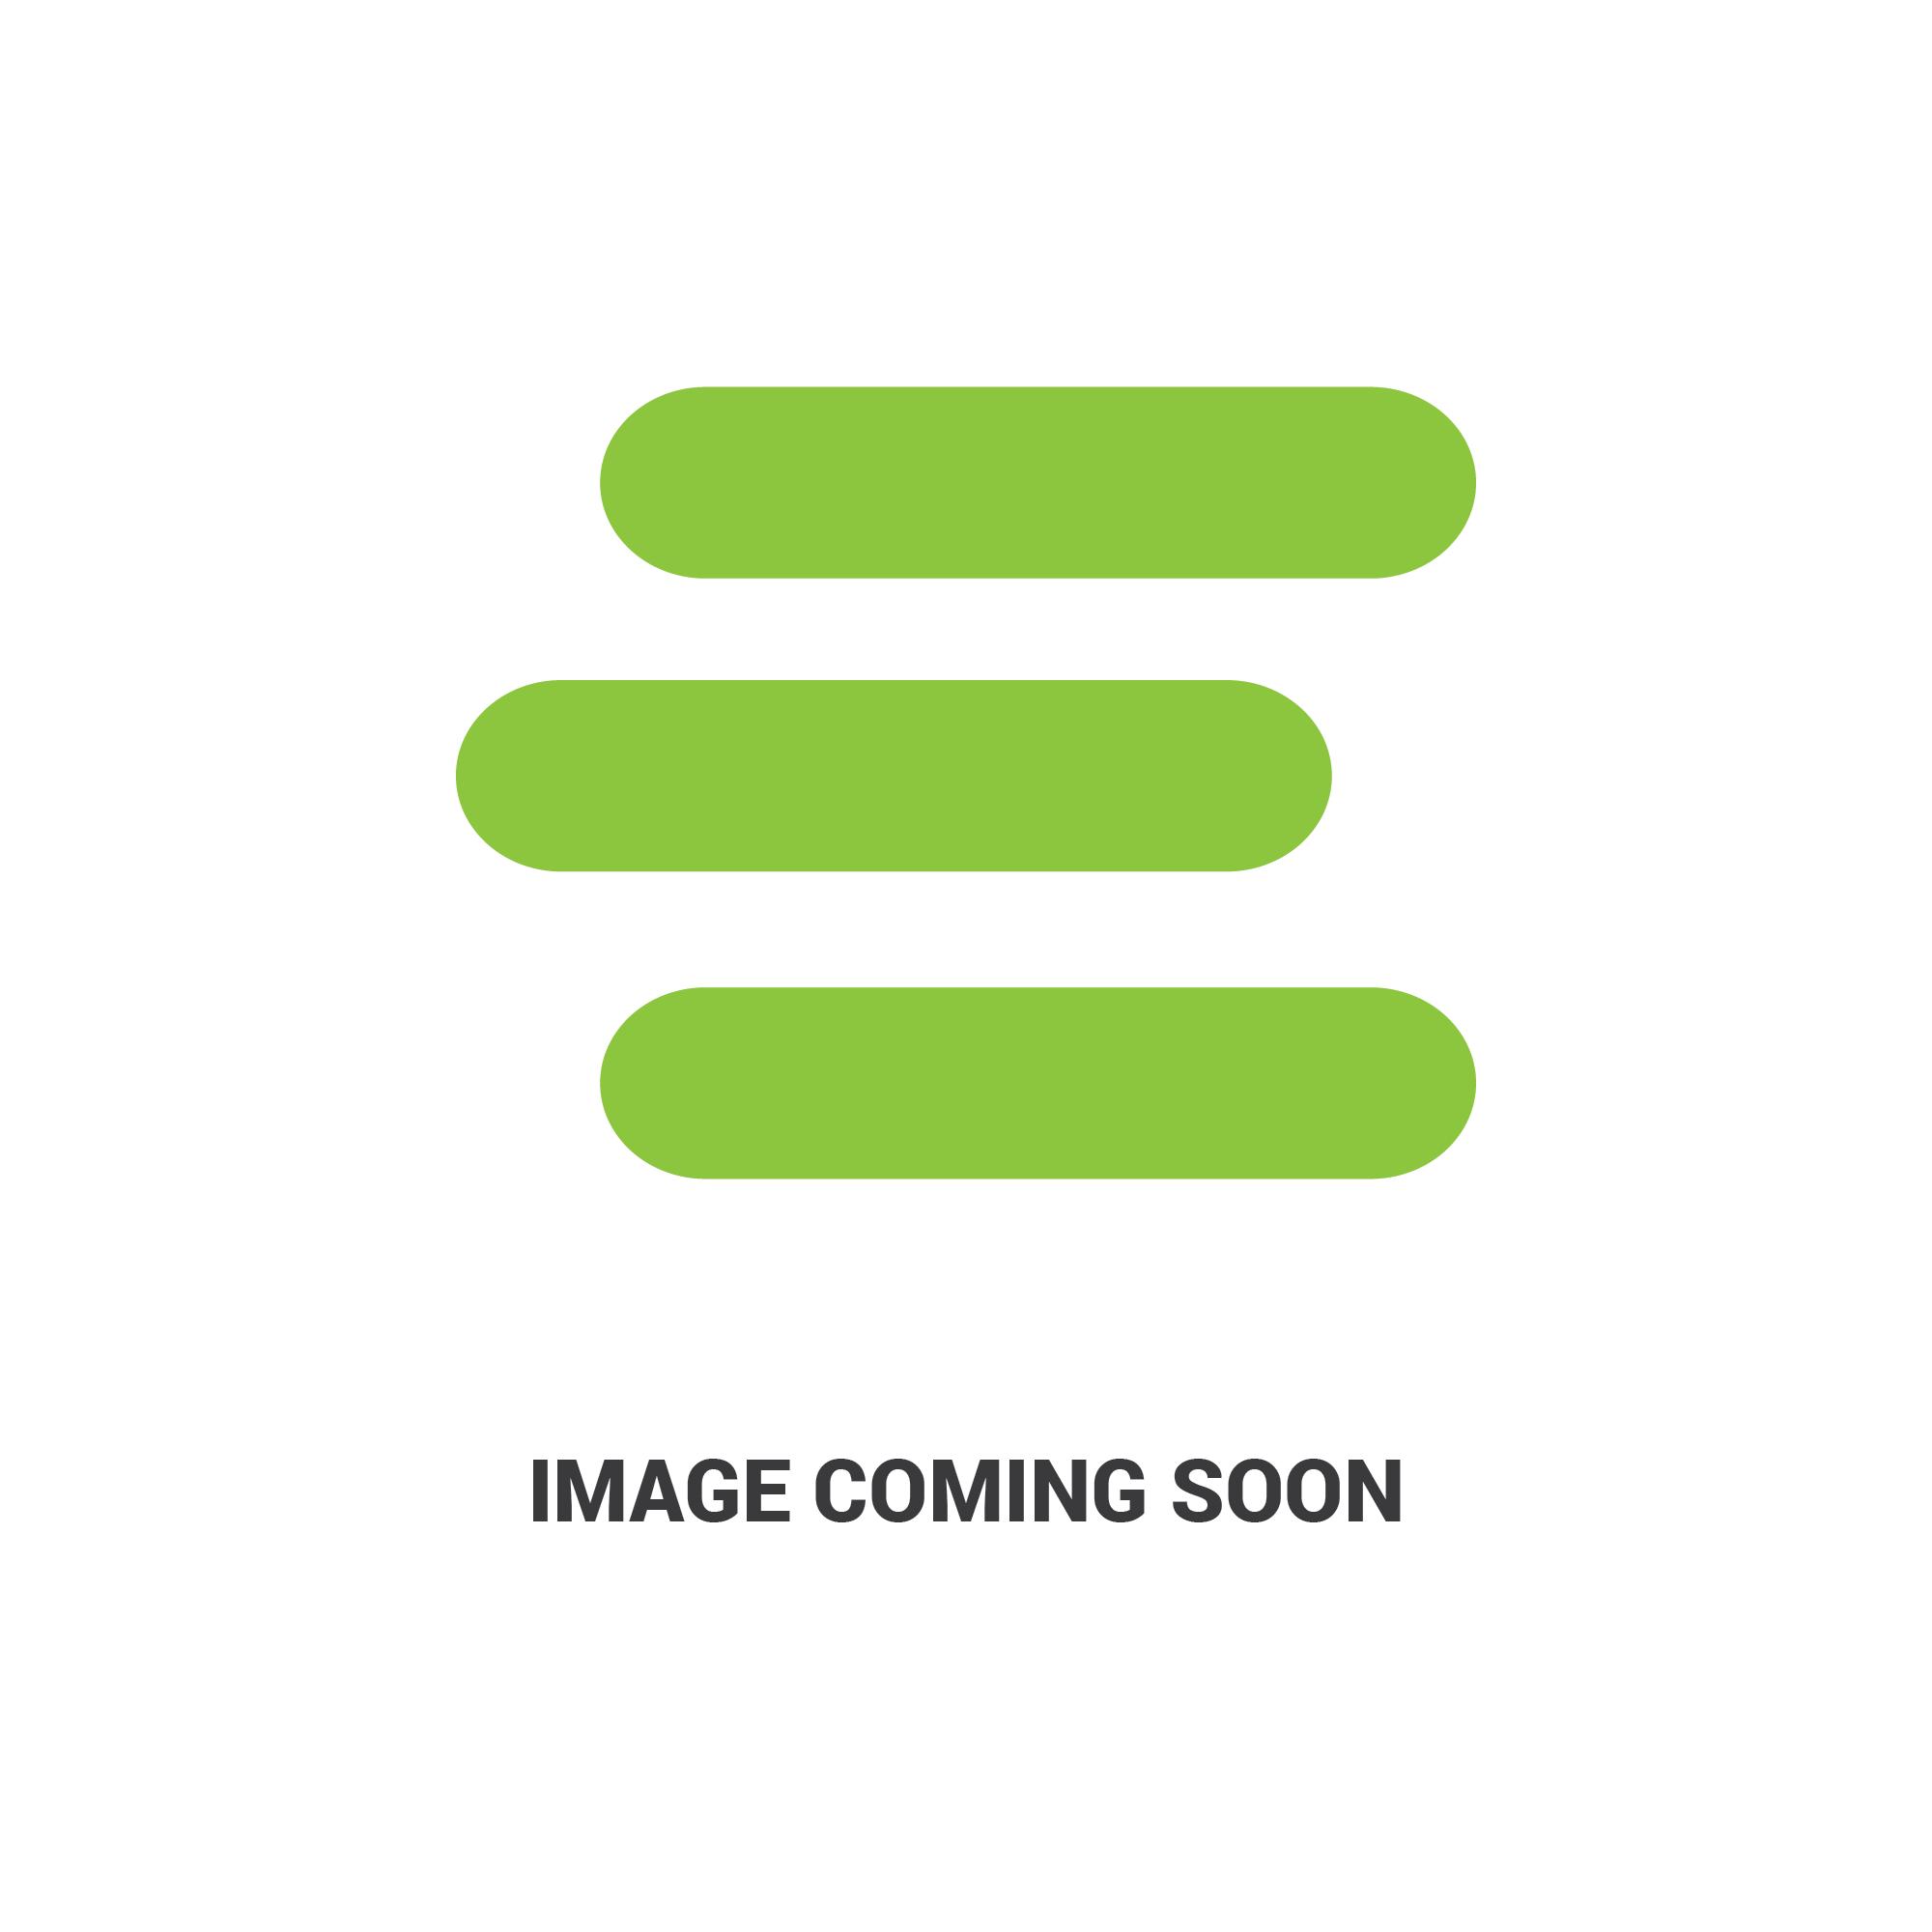 E-6C040-561202266_1 0.jpg